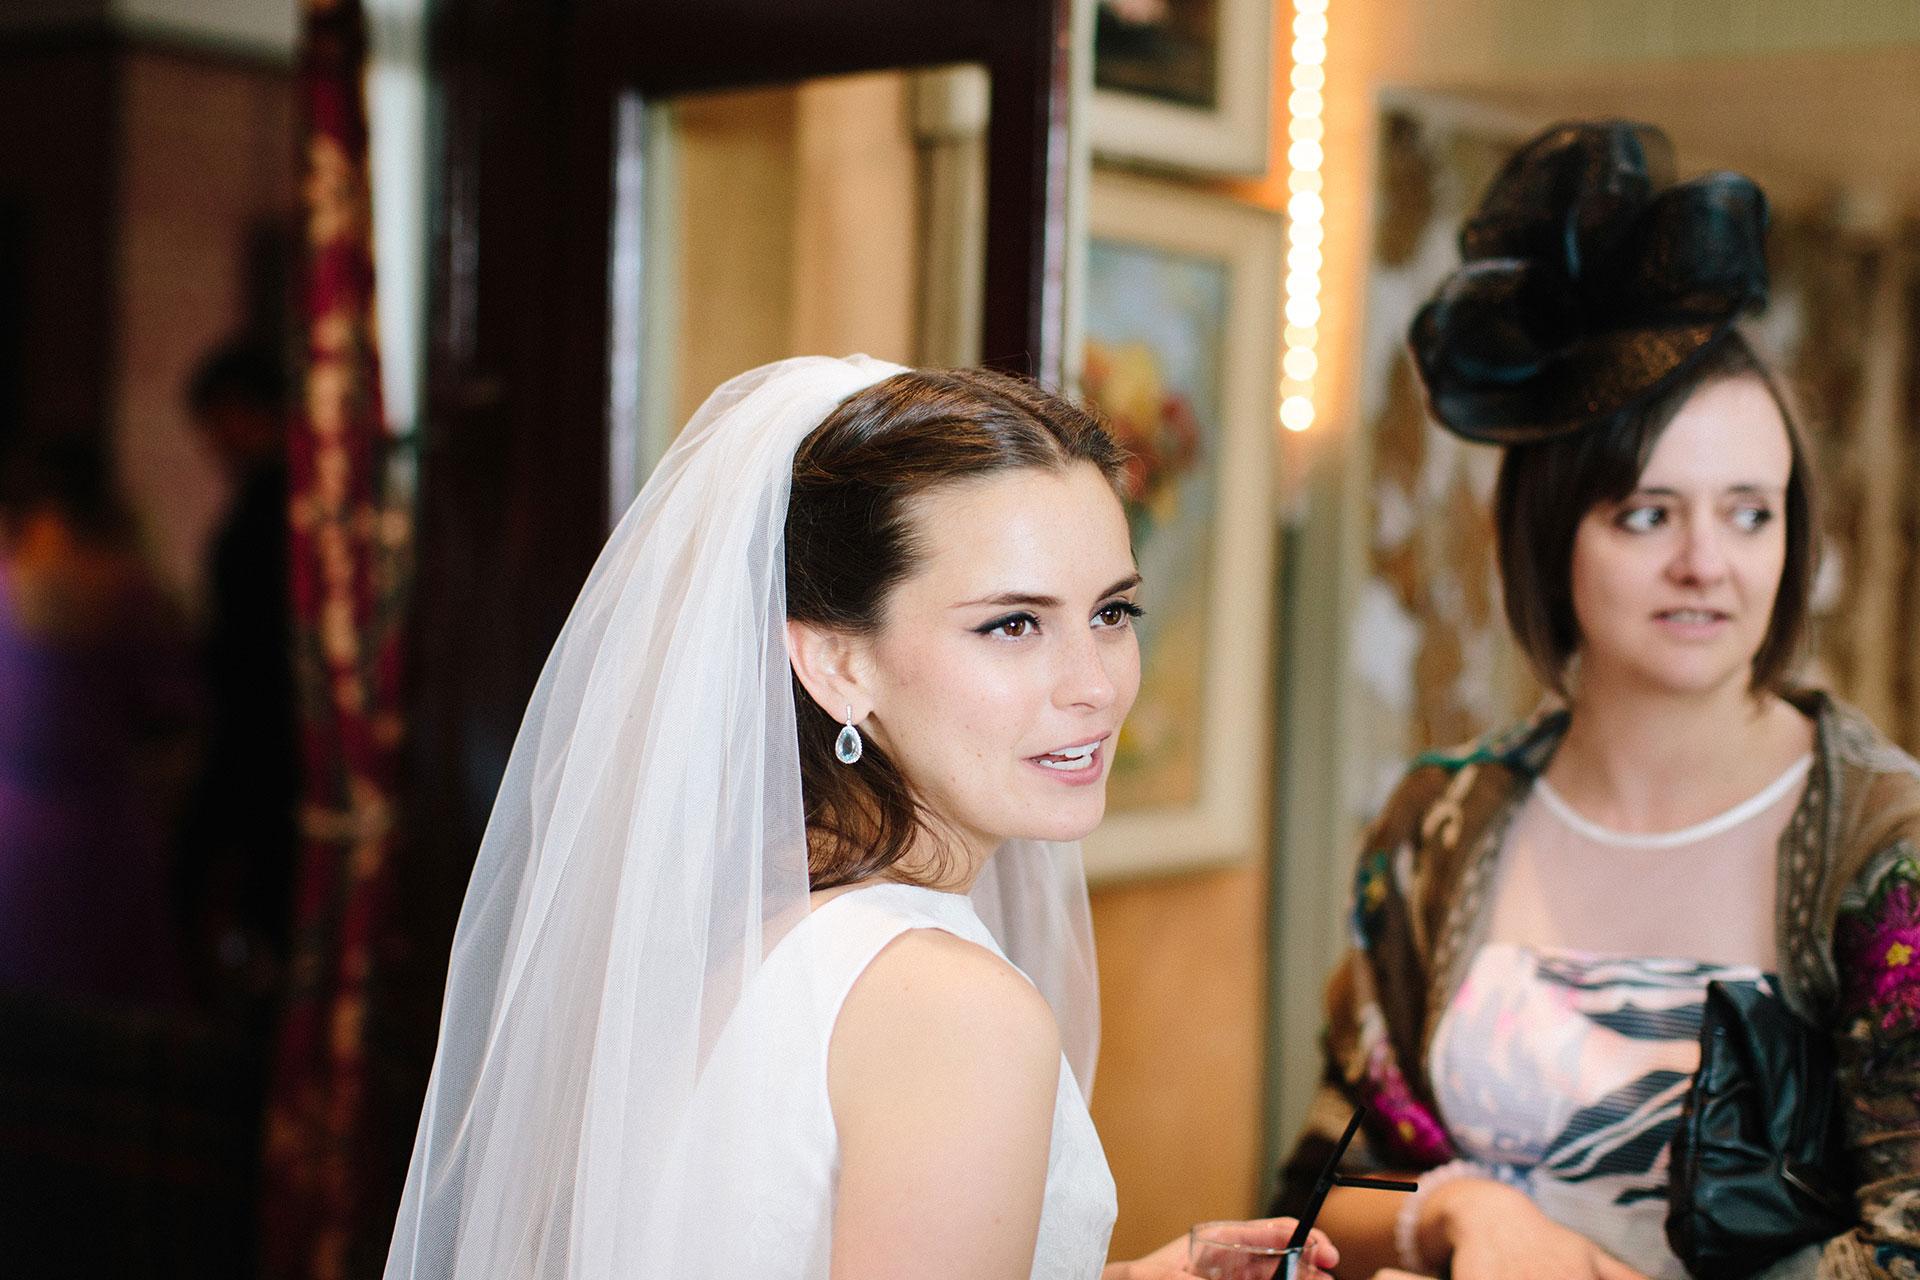 Langar-Hall-wedding-photographer-in-Nottinghamshire-Michael-Newington-Gray-50.jpg